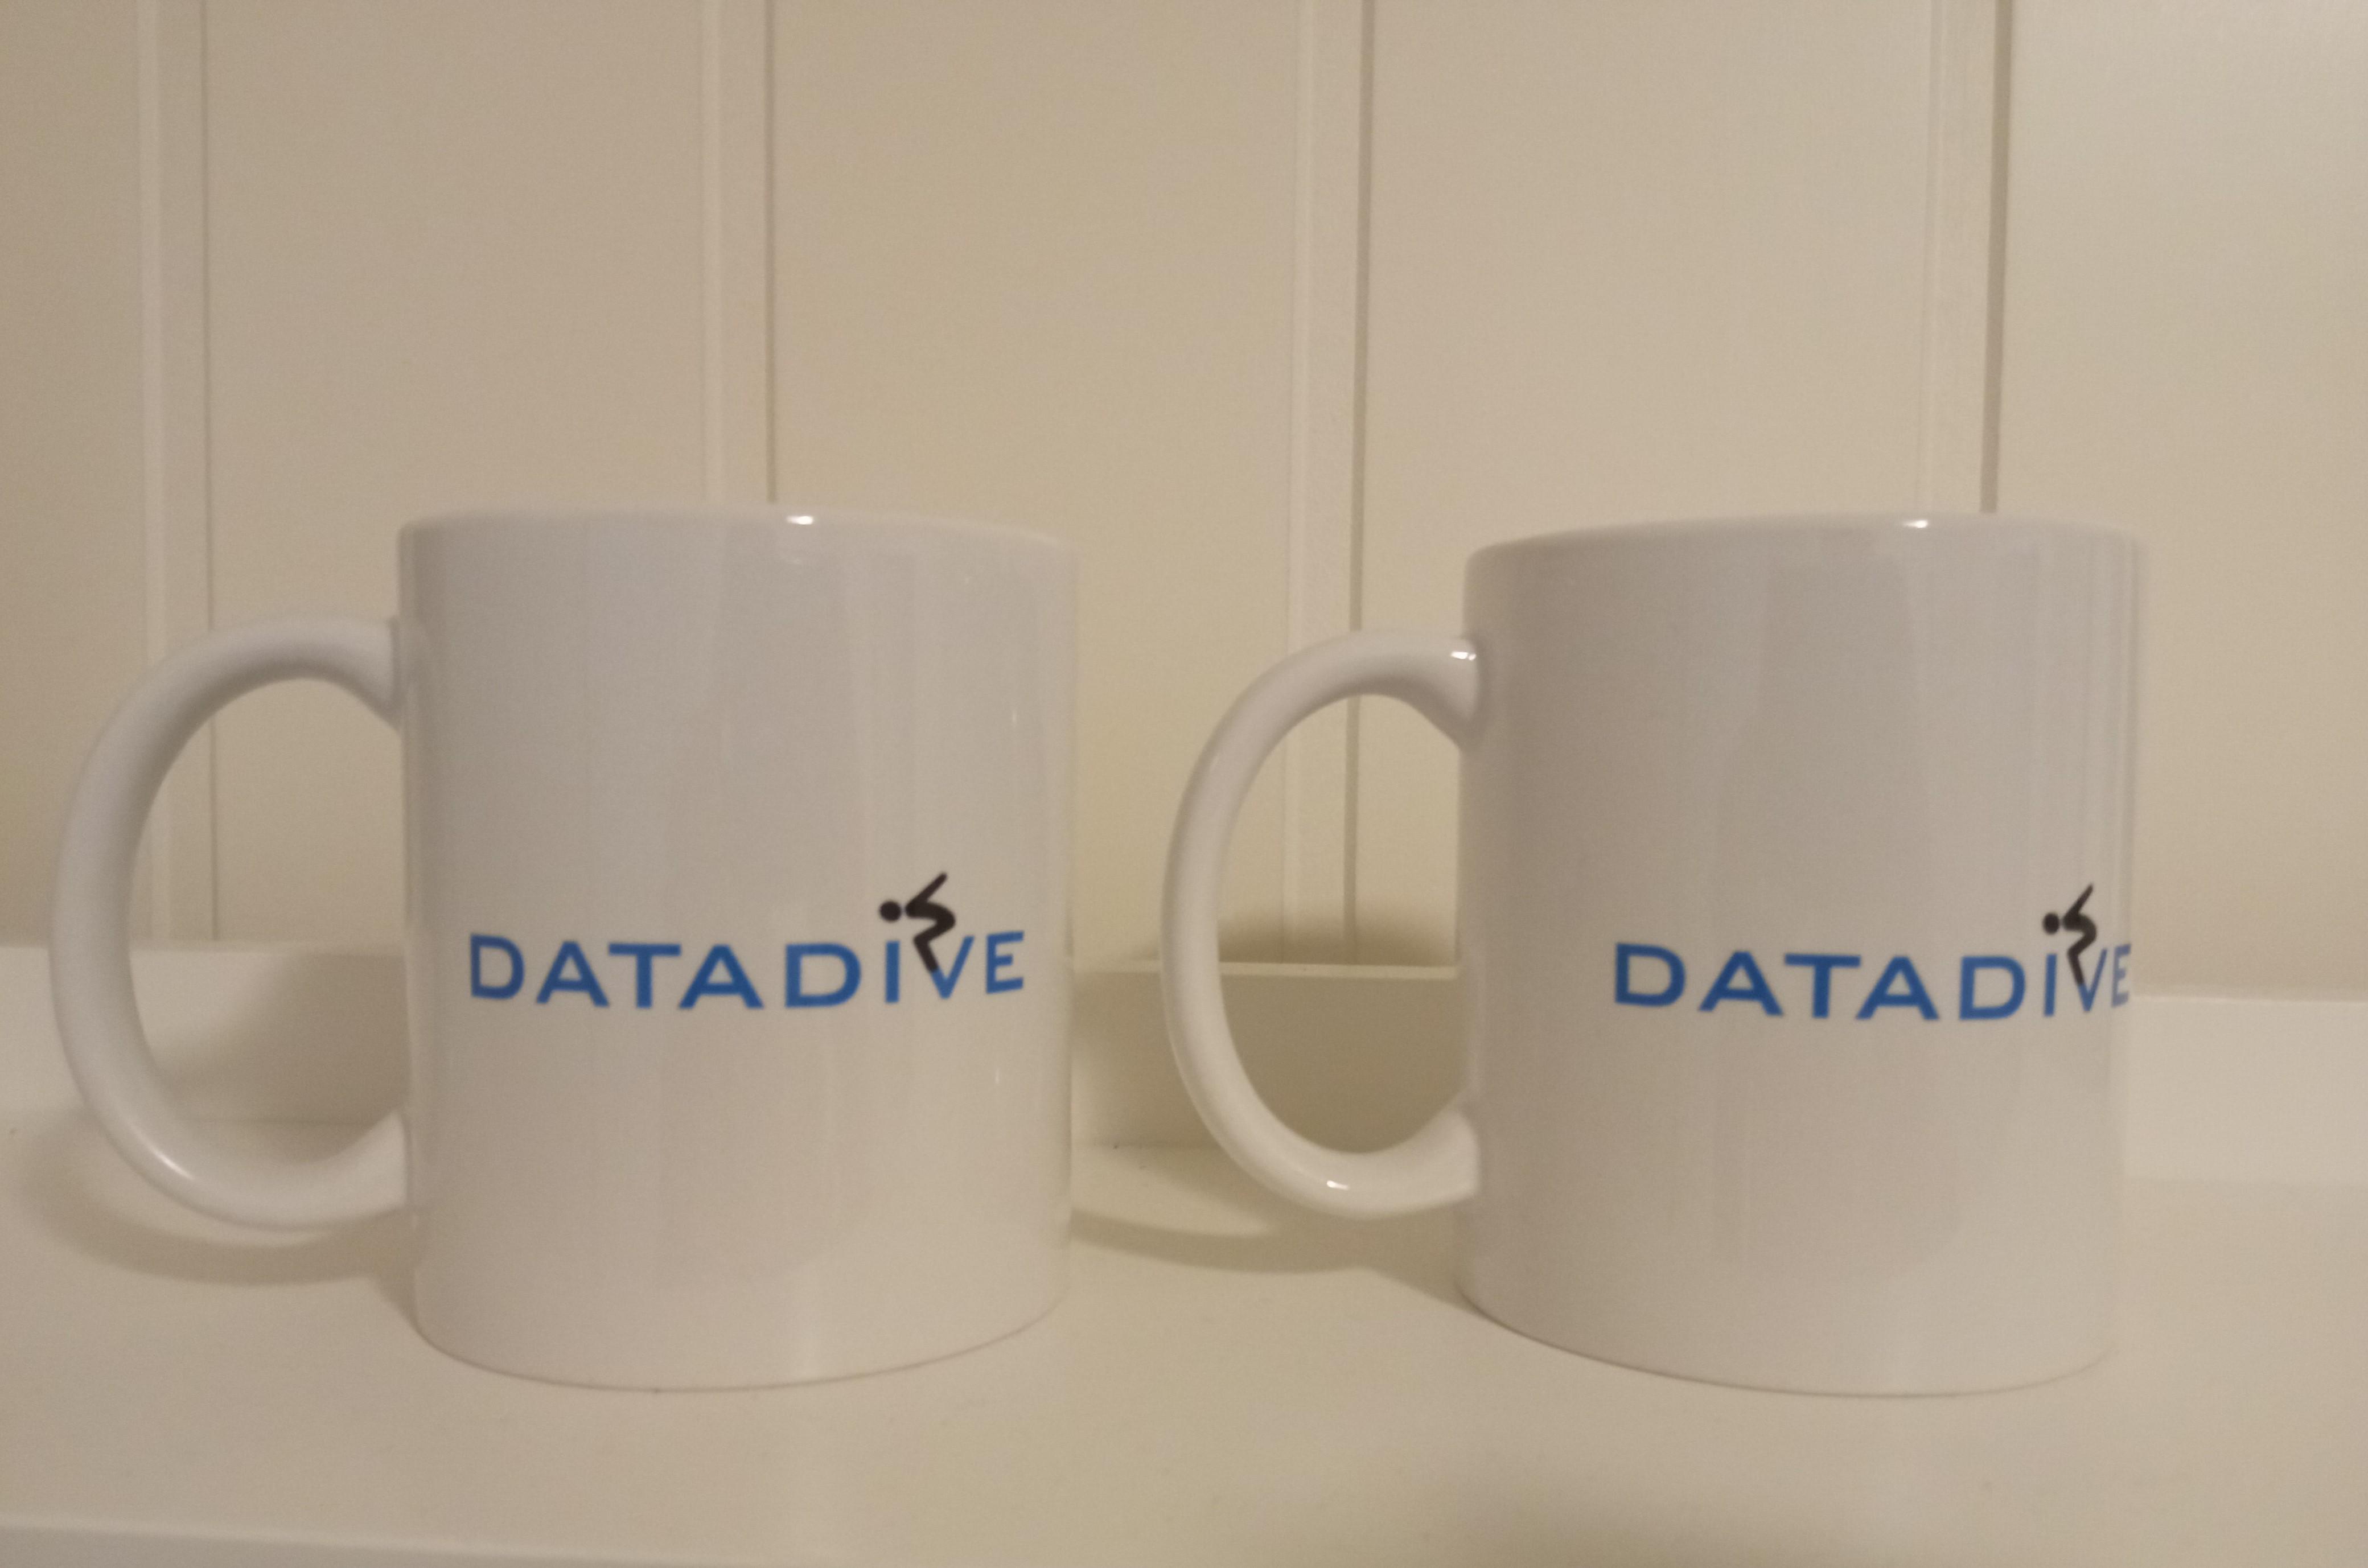 Datadive coffee meeting